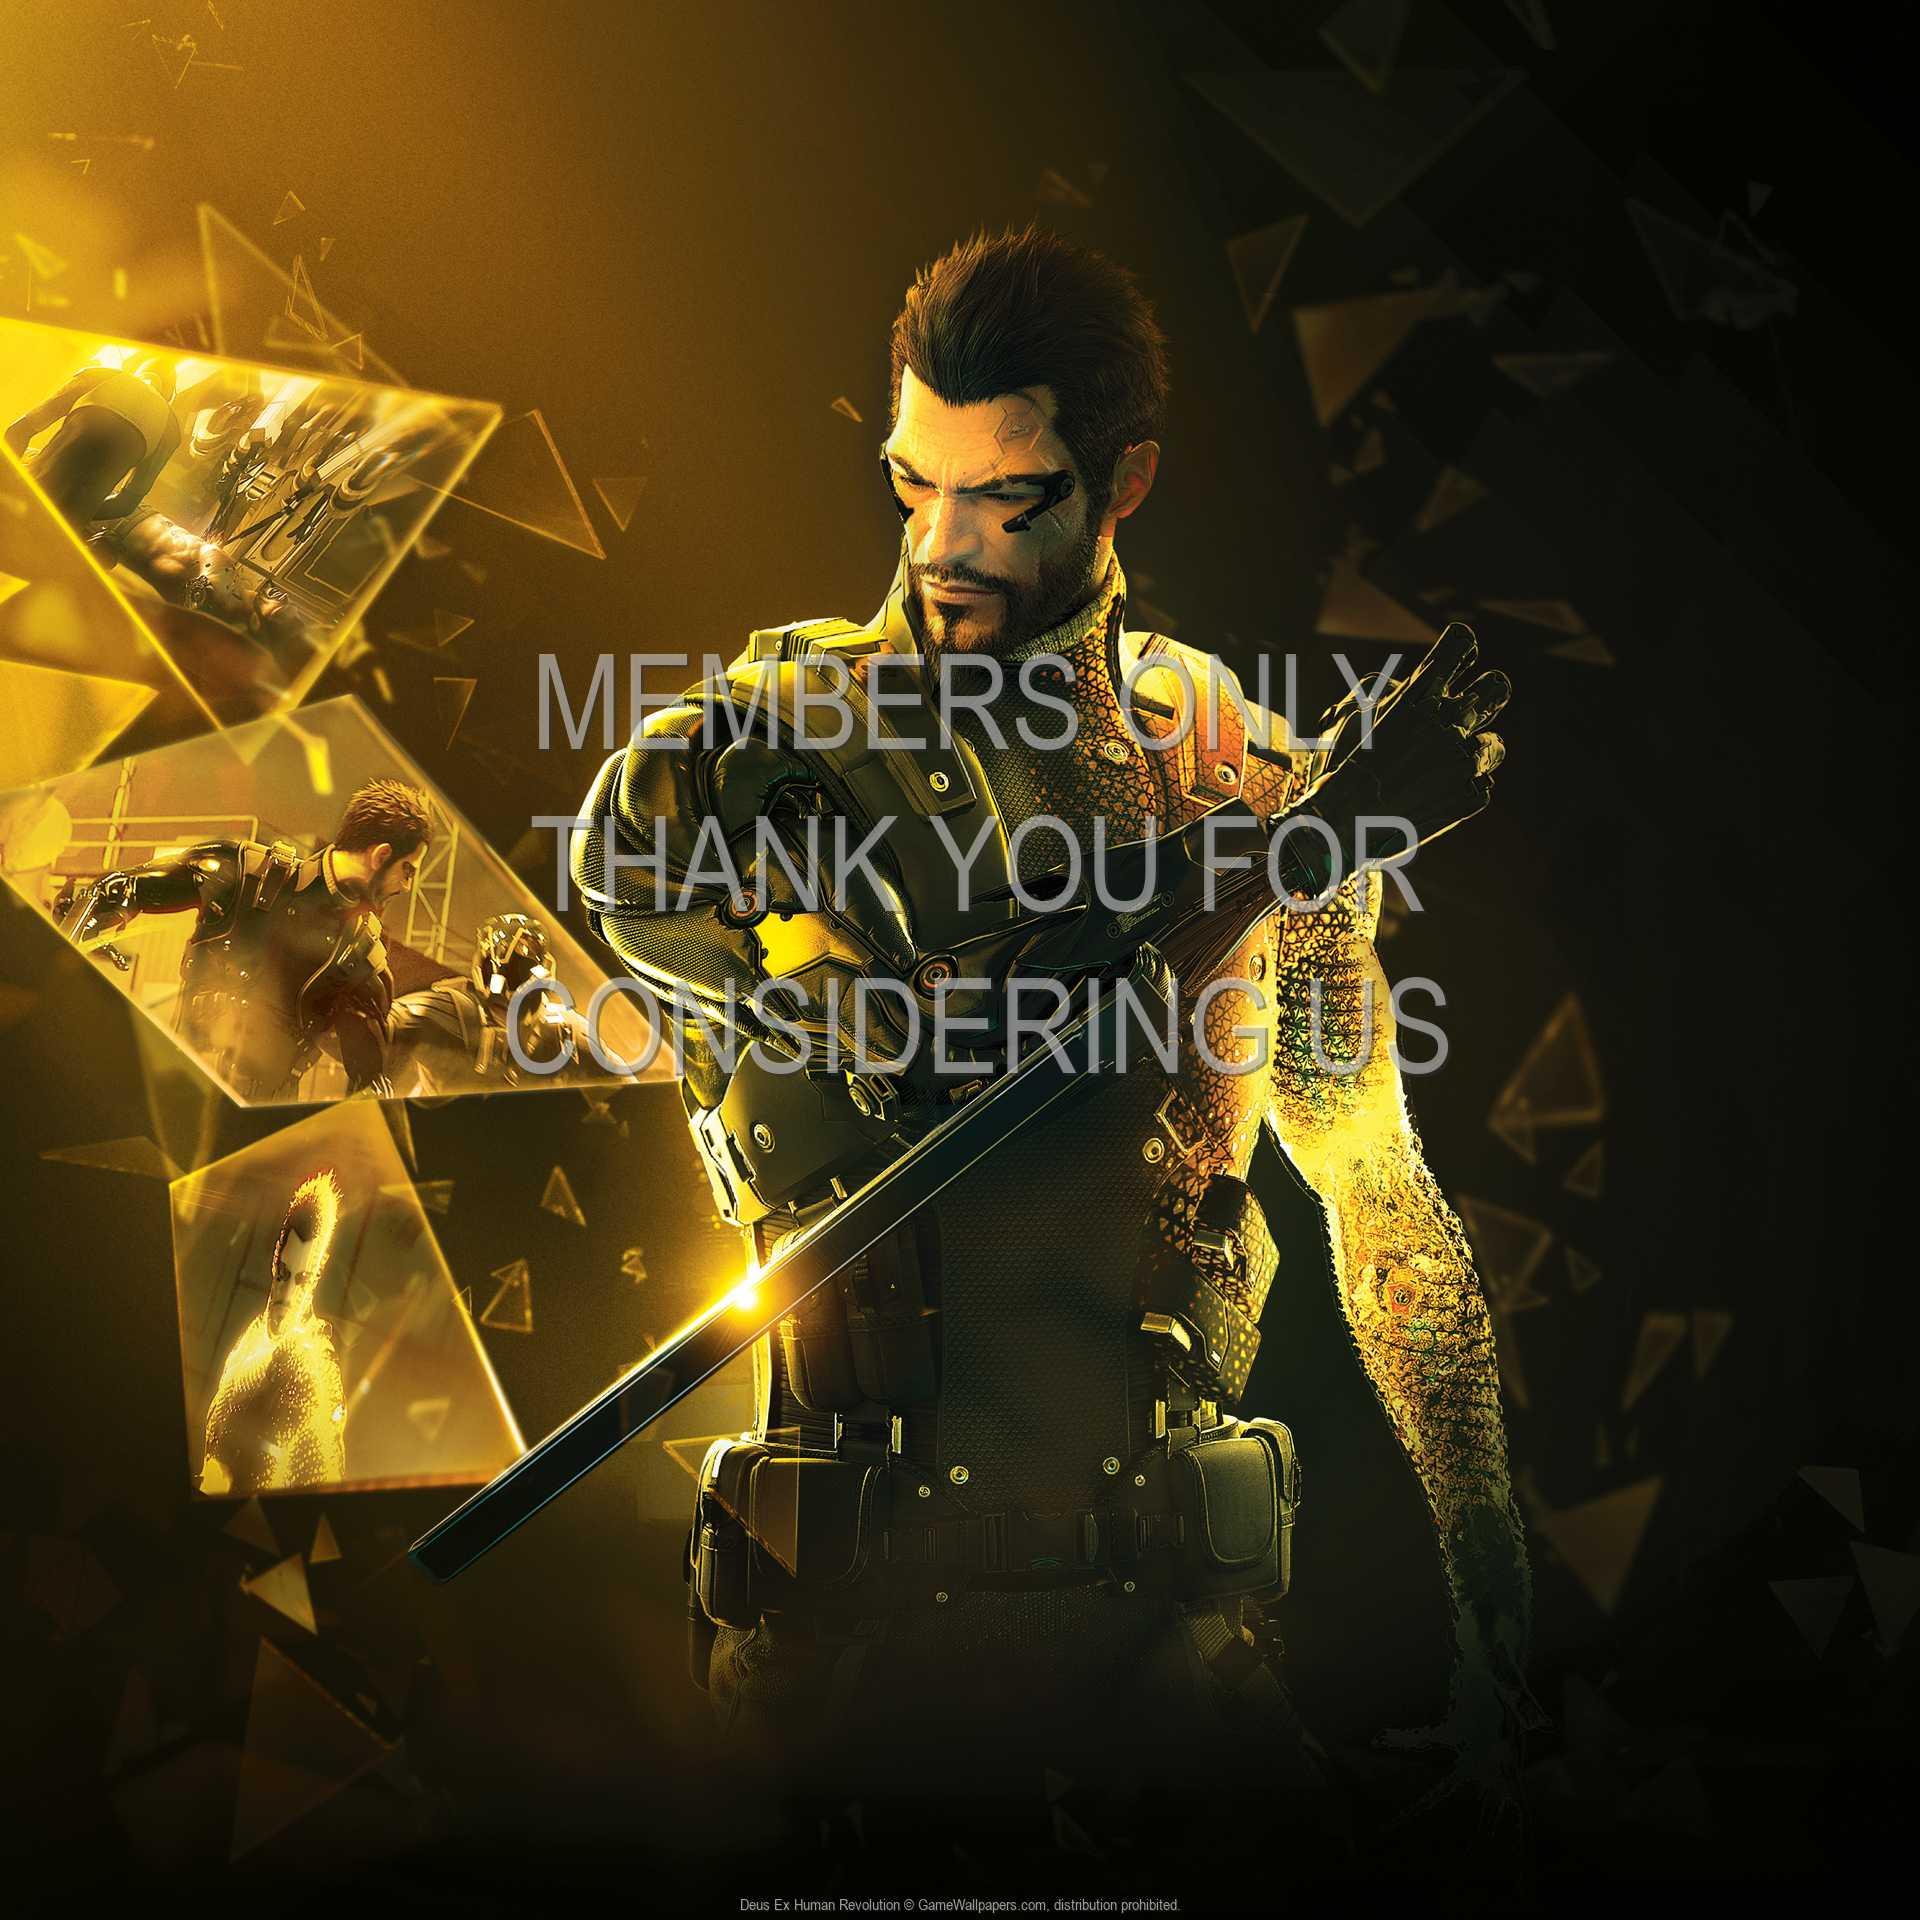 Deus Ex: Human Revolution 1080p Horizontal Handy Hintergrundbild 18